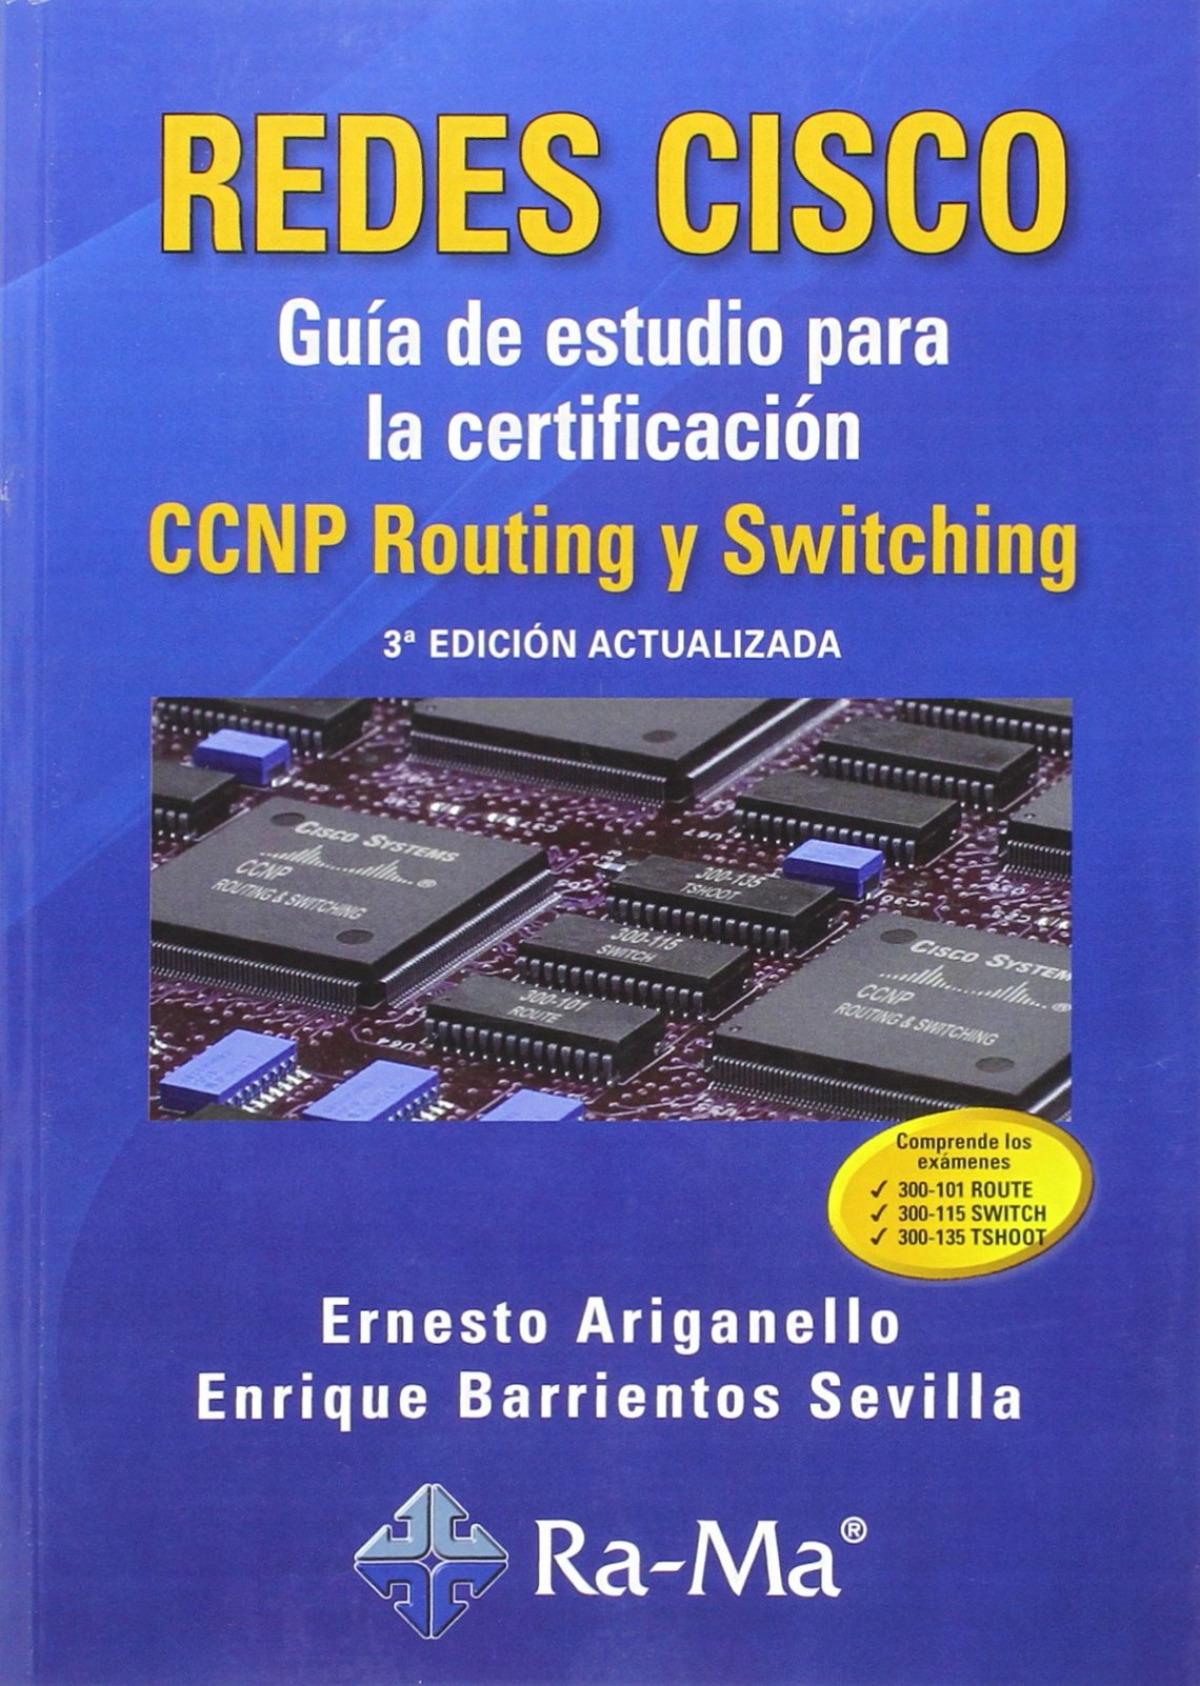 GUIA ESTUDIO CERTIF.CCNP (3a. ED.ACT.2015).(REDES CISCO) 9788499645643